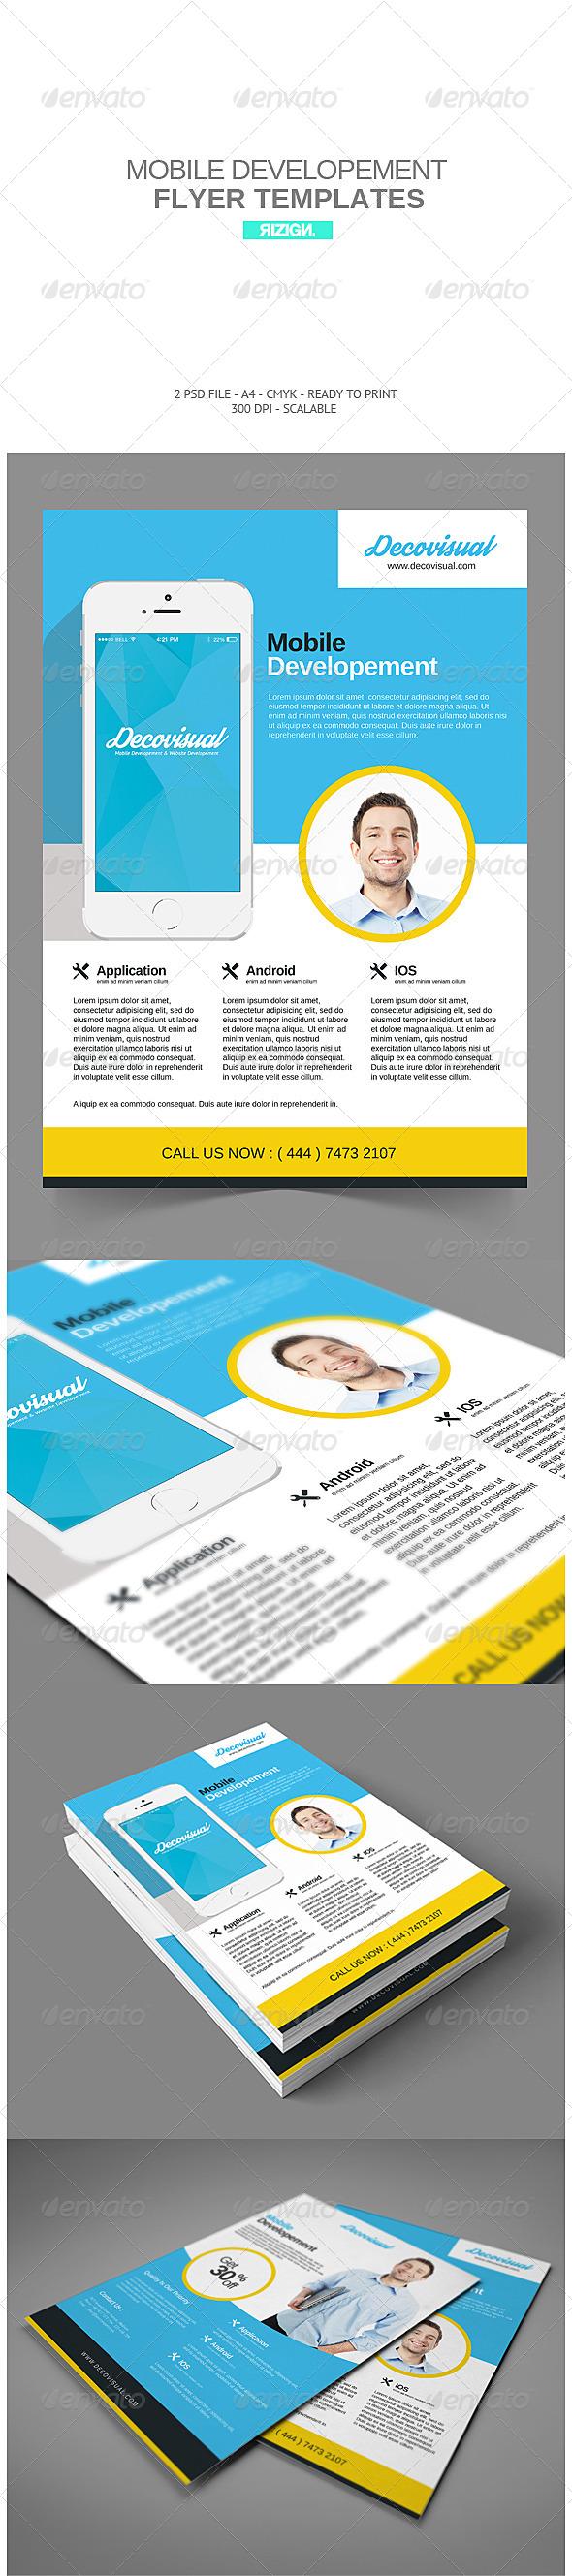 GraphicRiver Mobile Developement Flyer 7270540